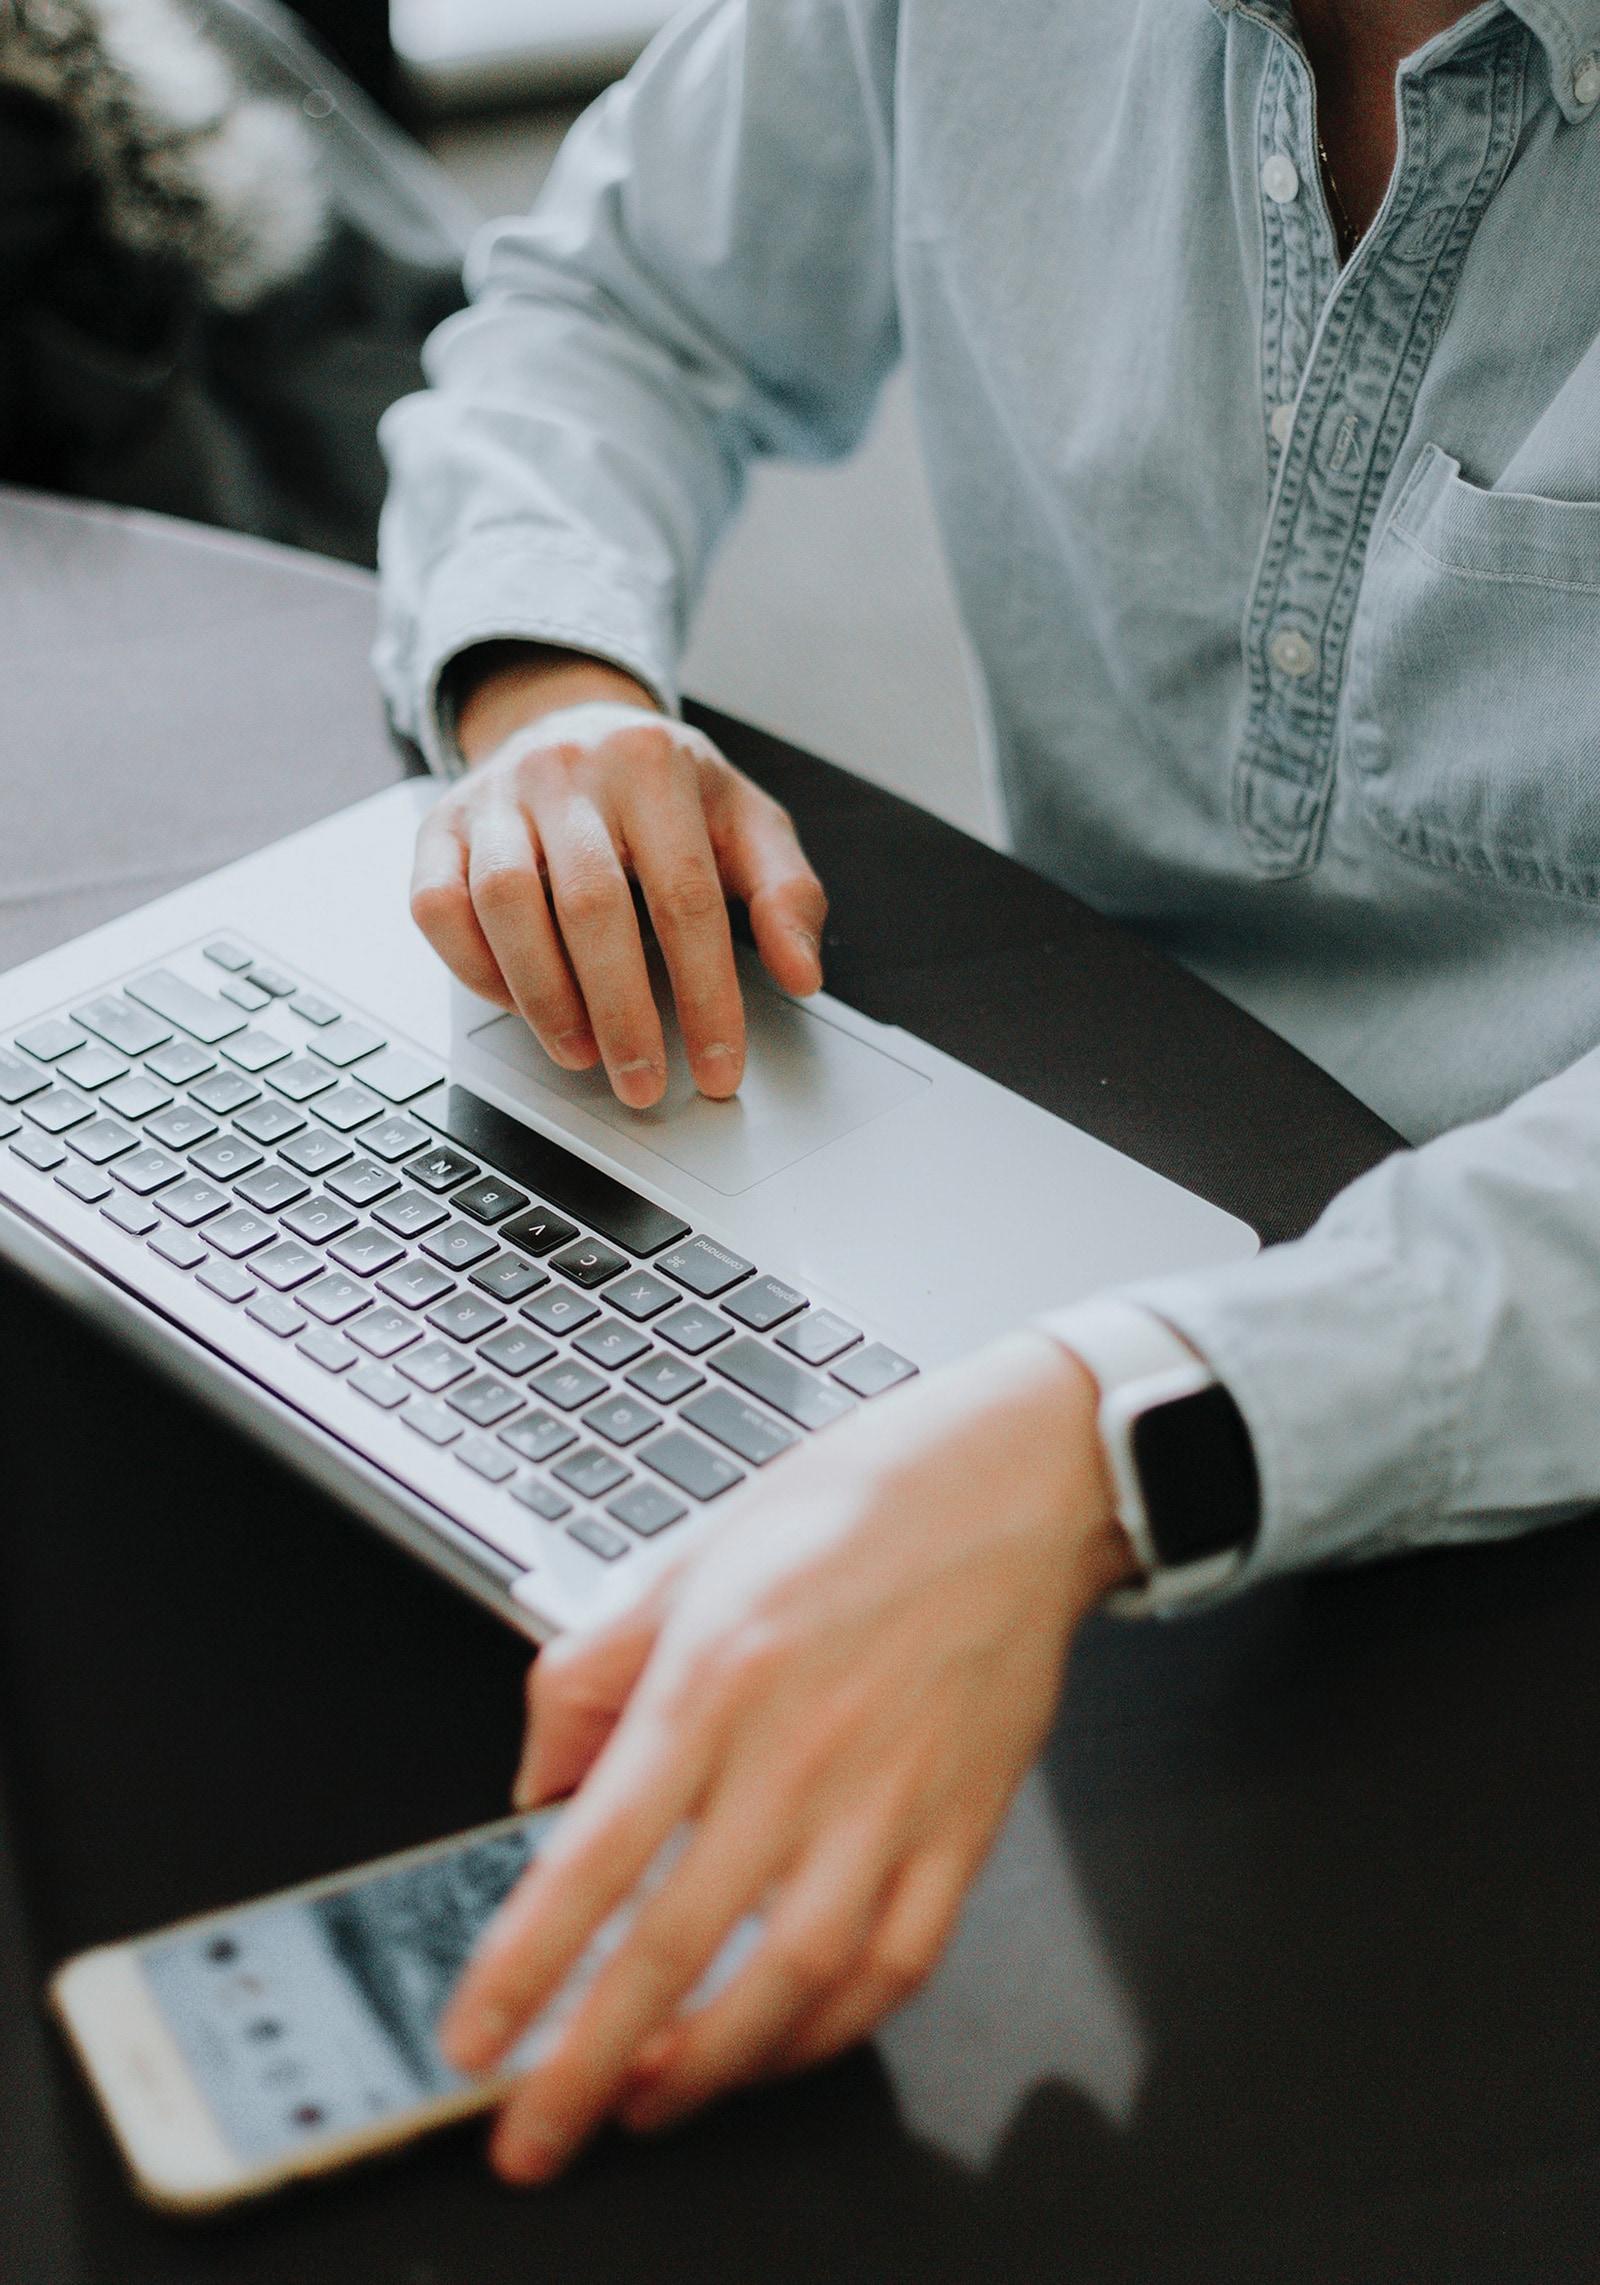 Services – Digital Advertising